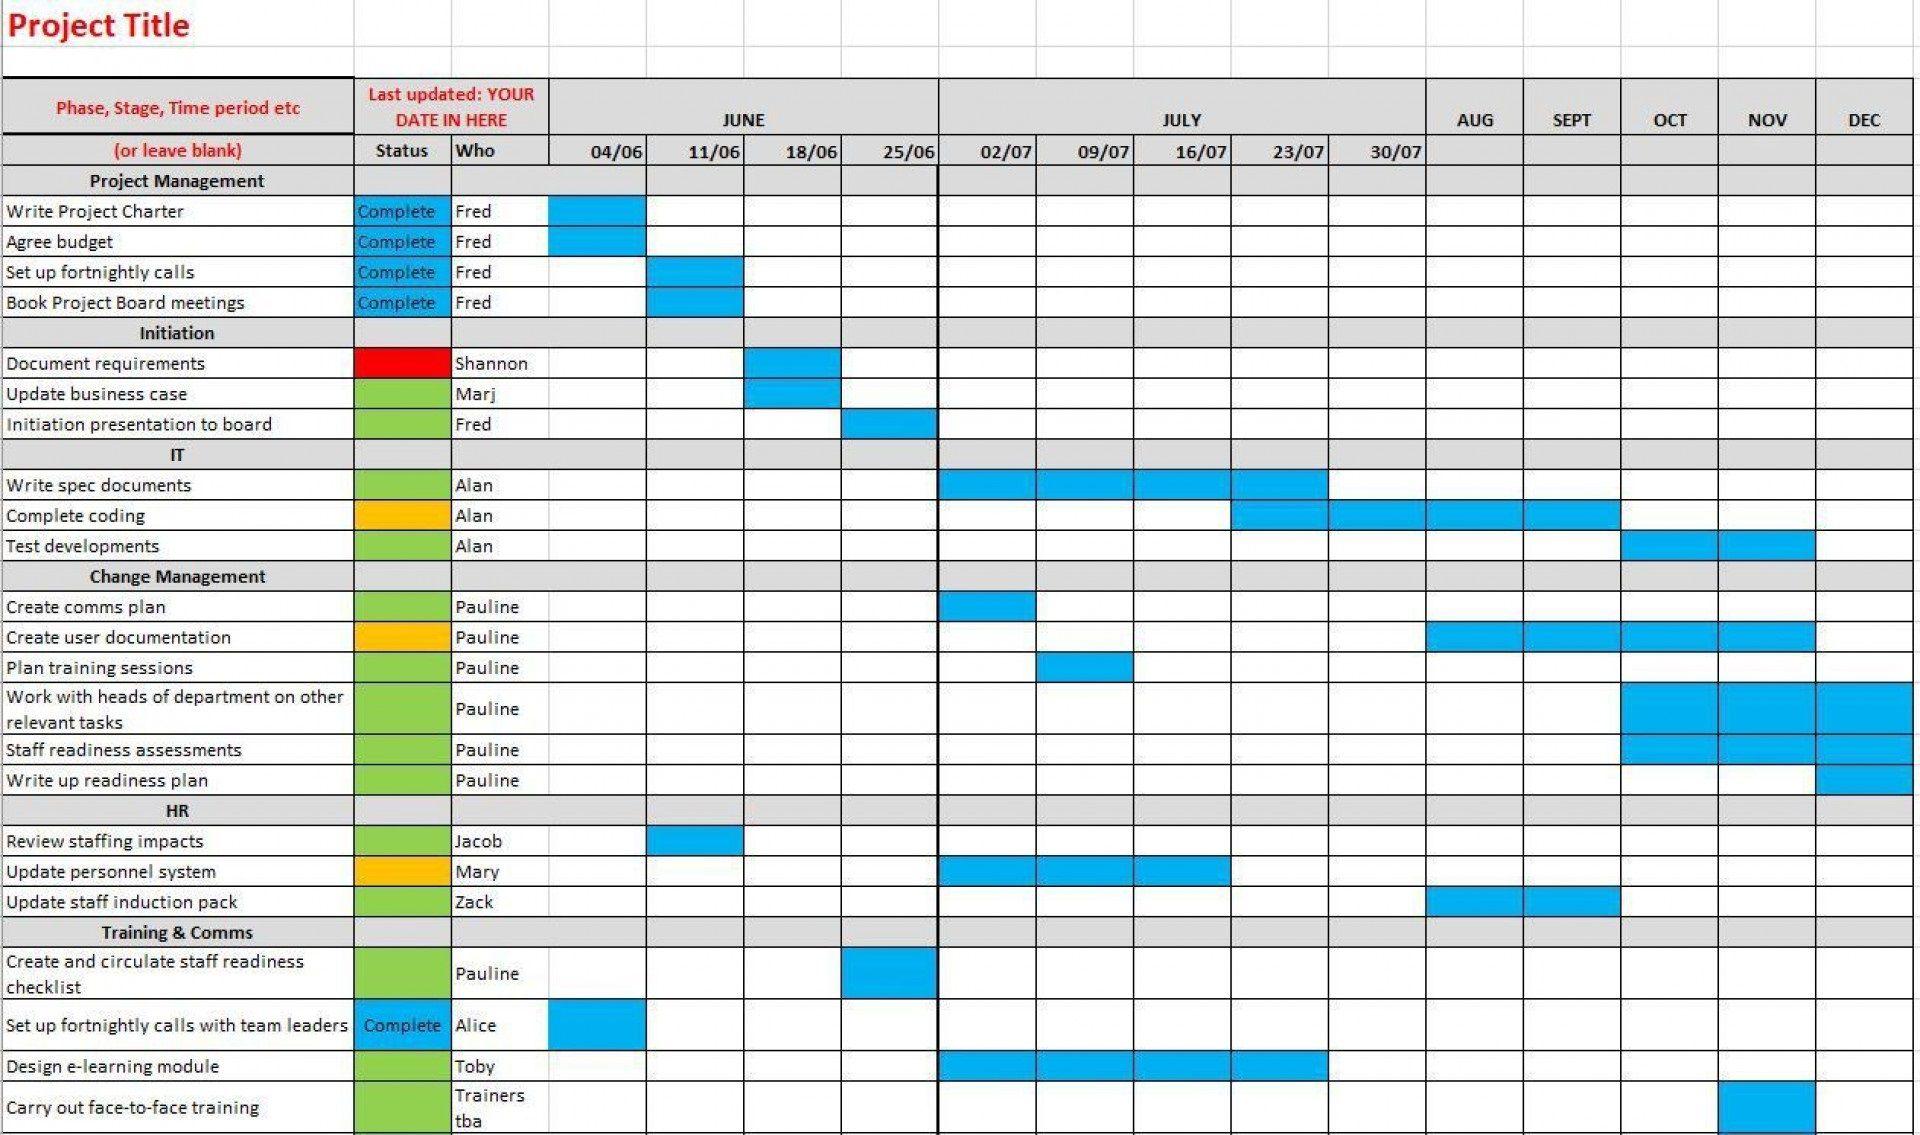 003 Breathtaking Project Management Timeline Template Excel Image  FreeFull